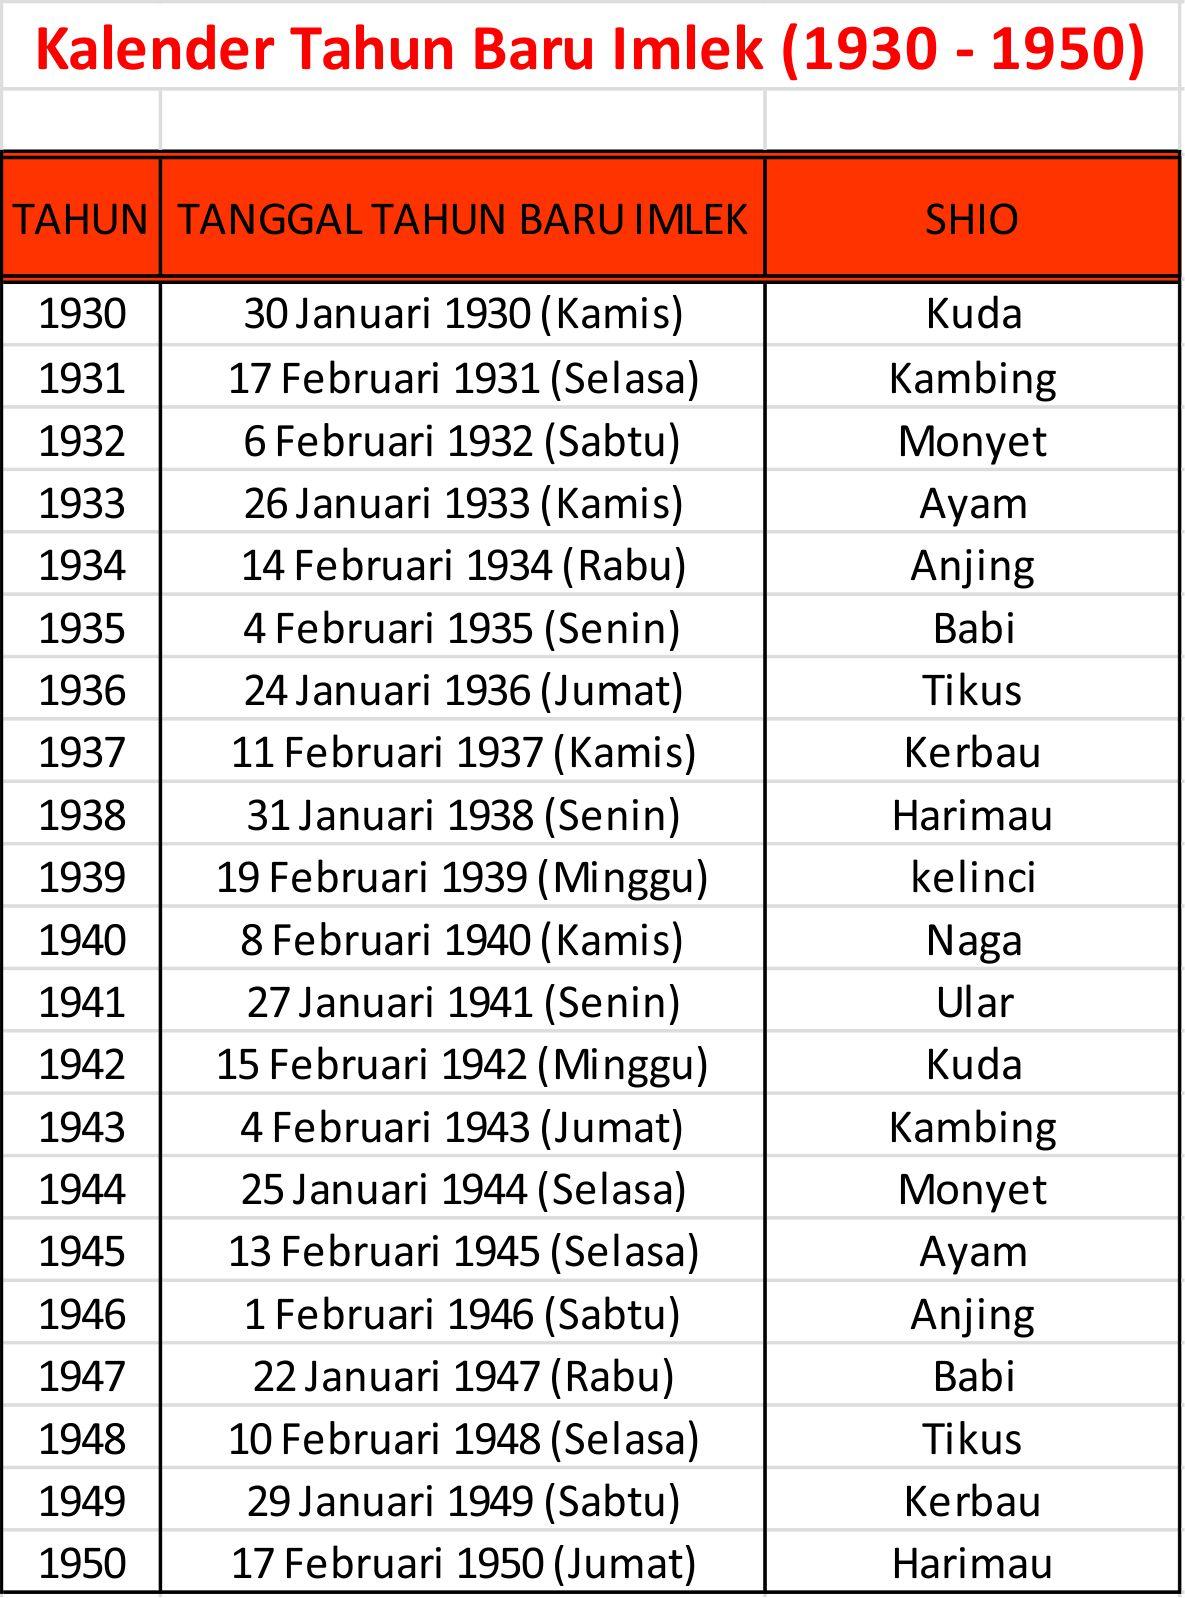 Kalender Tahun Baru Imlek (1930 - 1950)